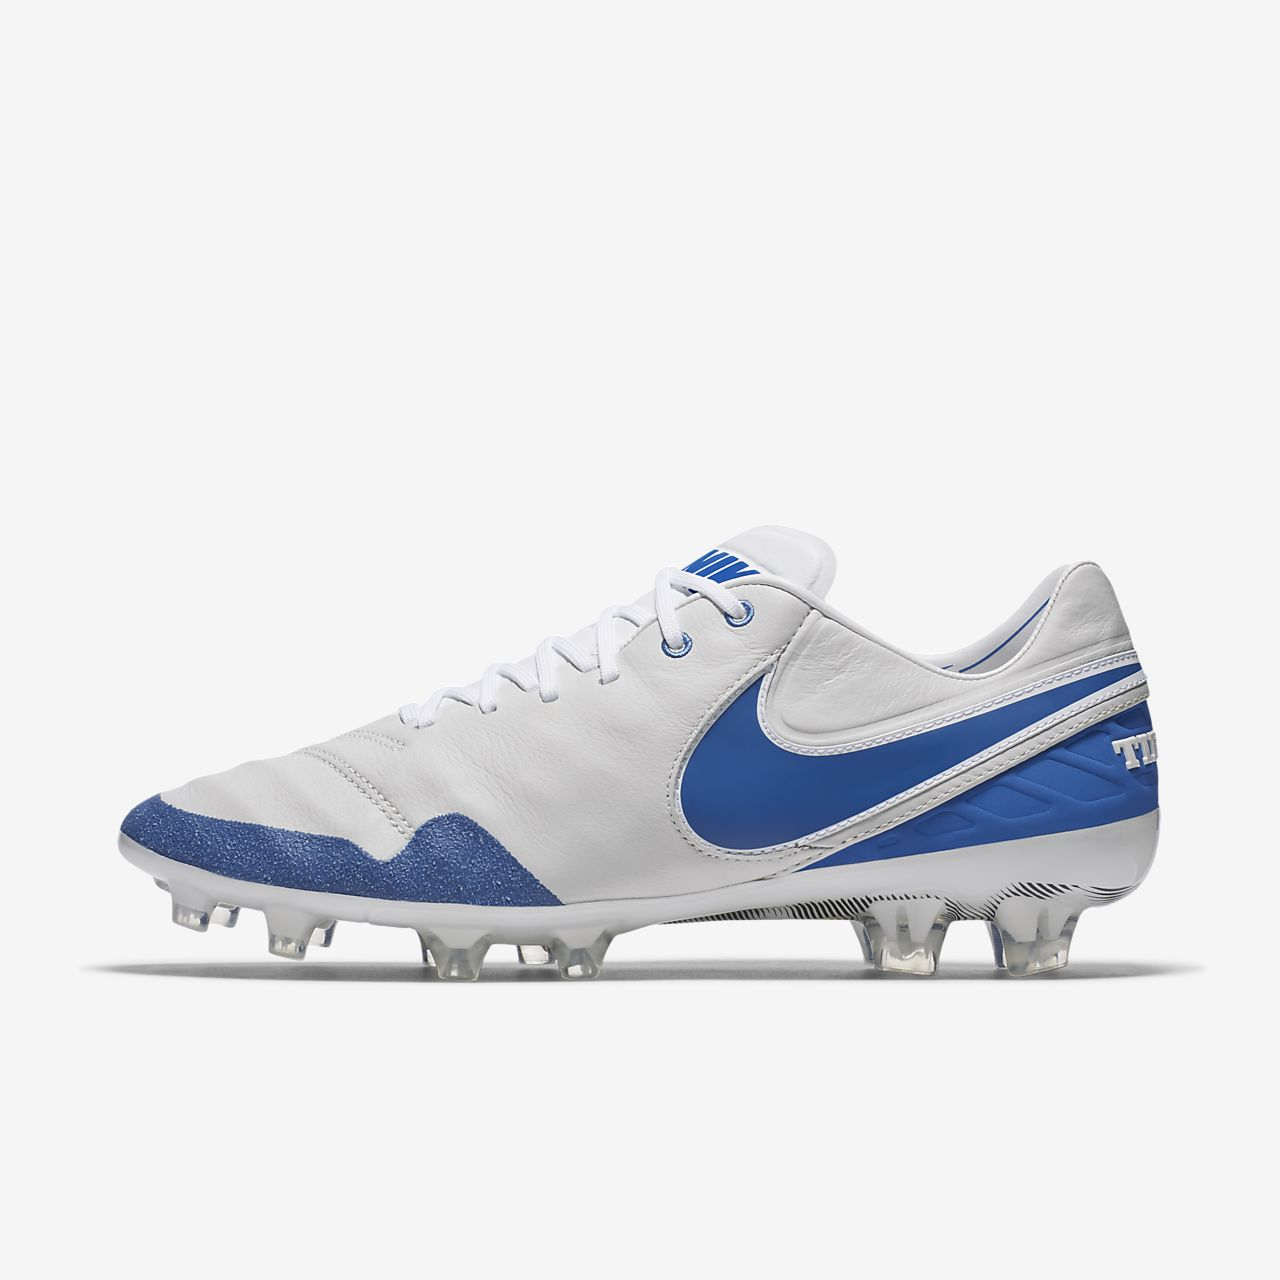 ... Nike Tiempo Legend VI SE Firm-Ground Football Boot